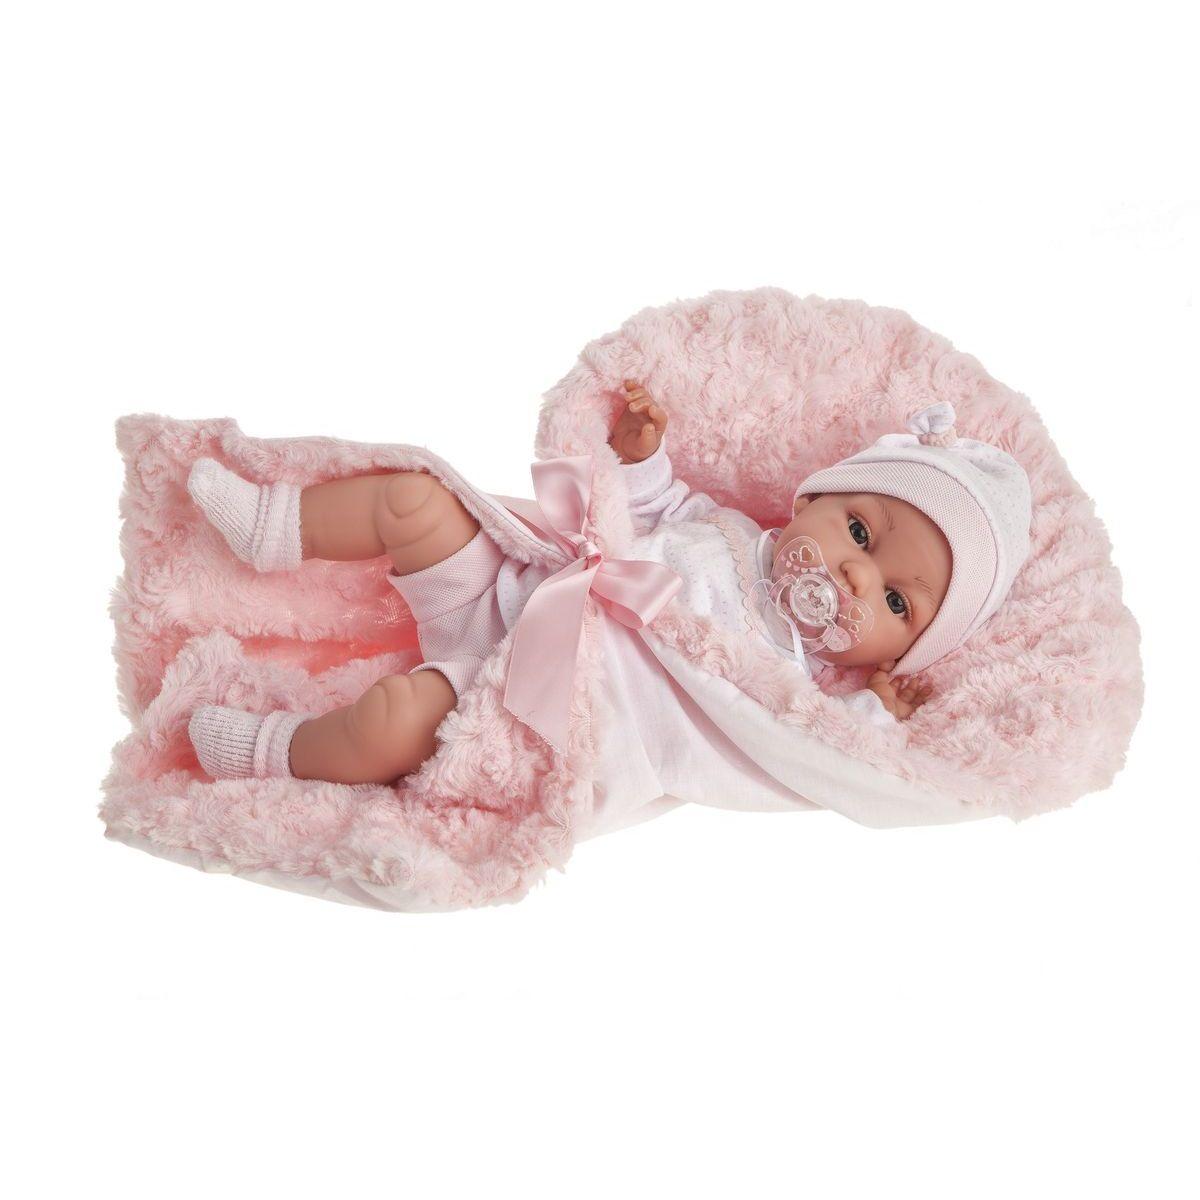 Antonio Juan 7030 Toneta realistická panenka miminko se zvuky a měkkým látkovým tělíčkem 34 cm